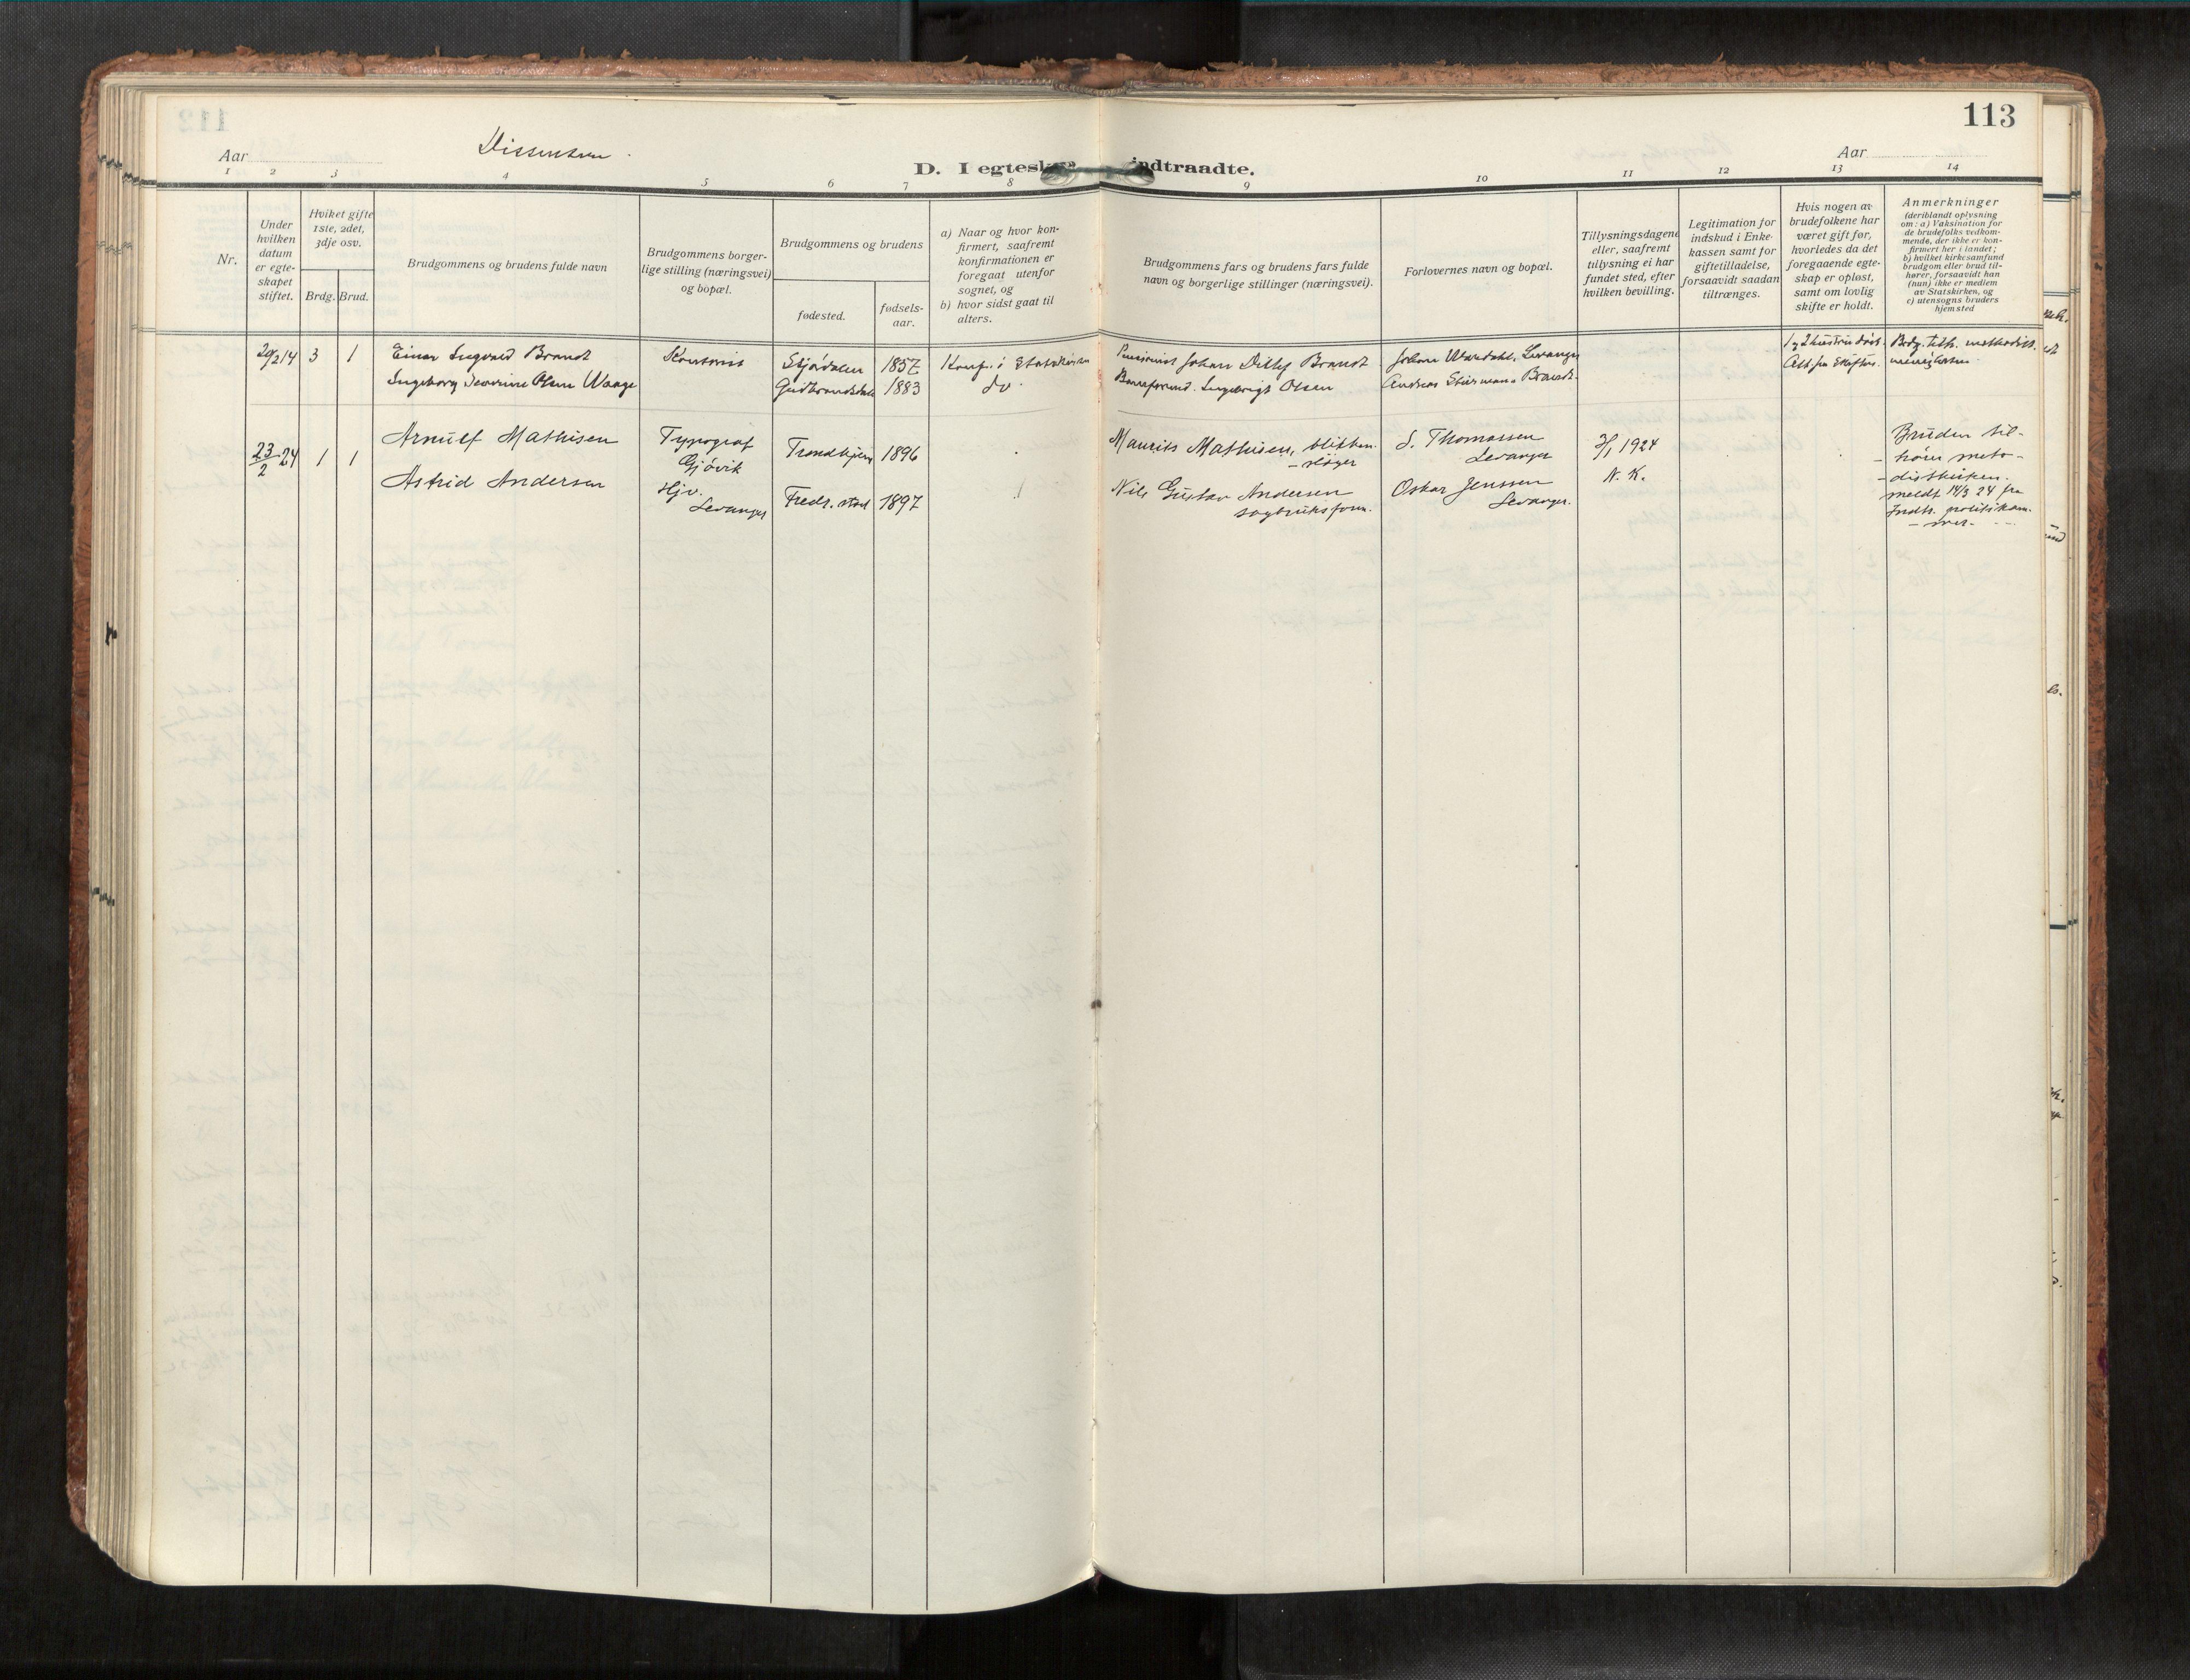 SAT, Levanger sokneprestkontor*, Parish register (official) no. 1, 1912-1932, p. 113